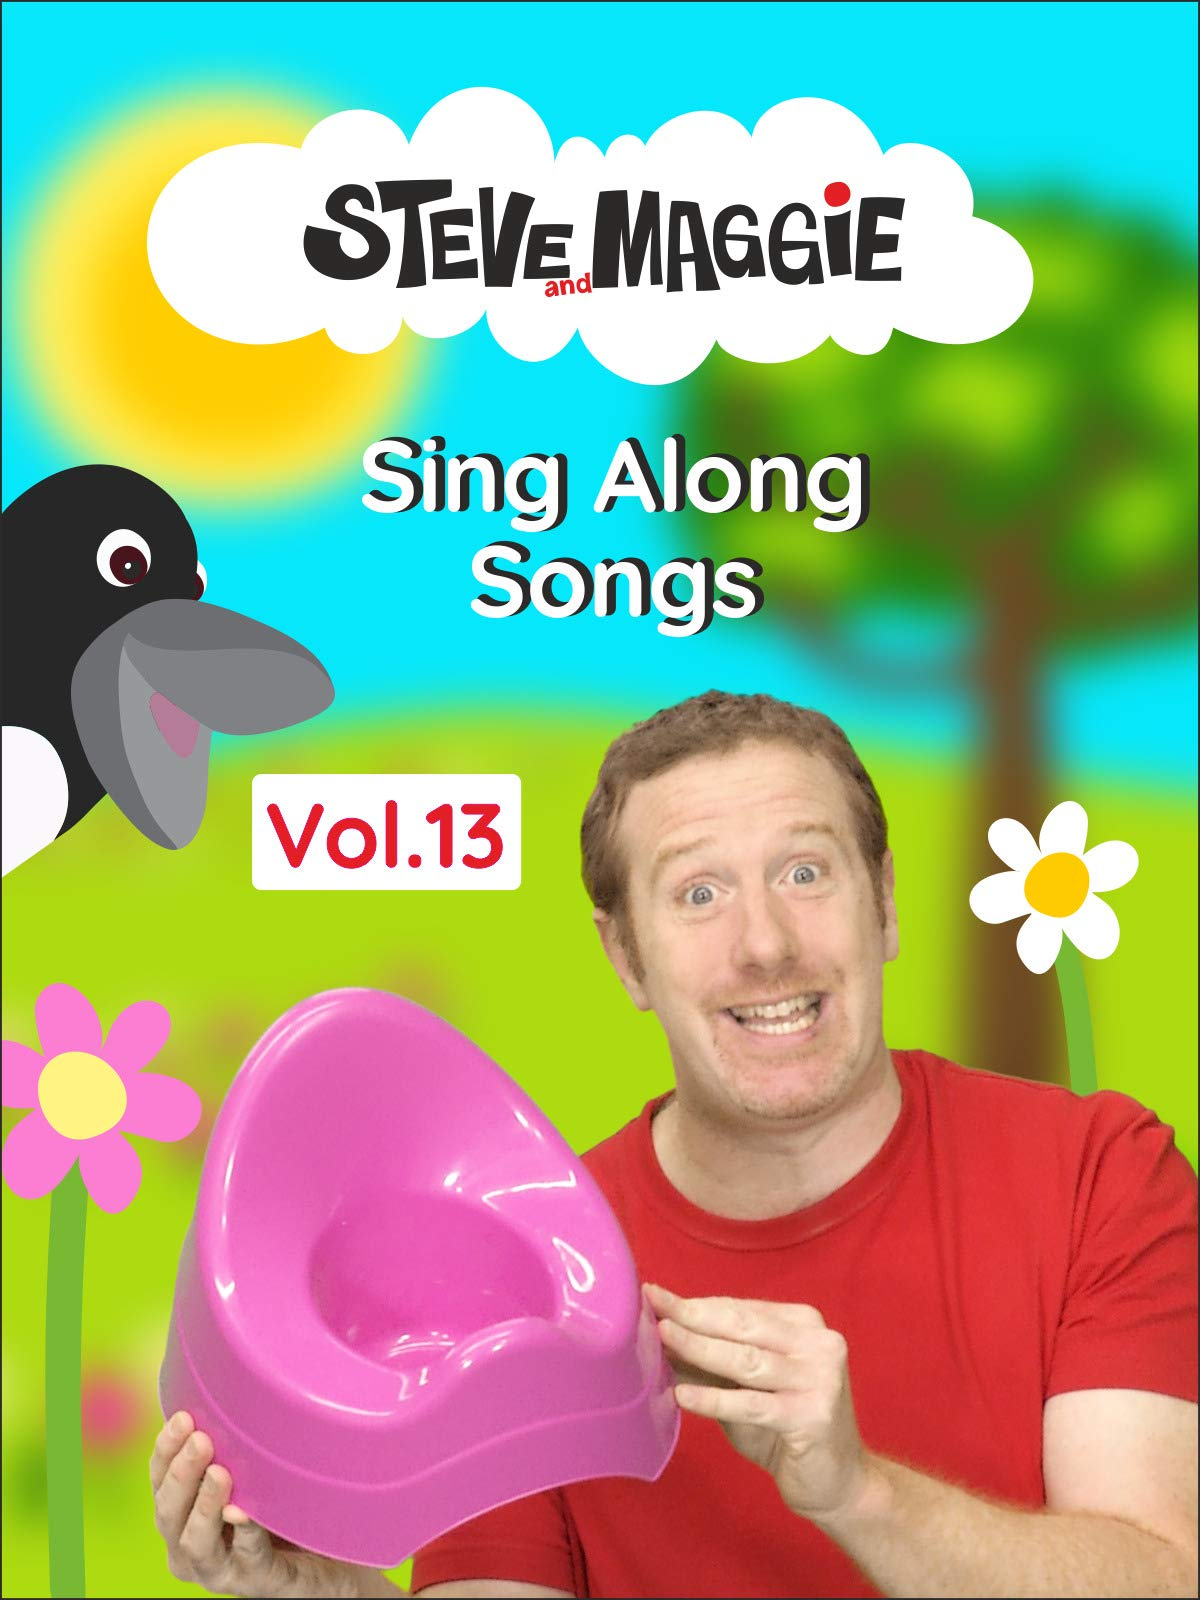 Steve and Maggie - Sing Along Songs (Vol. 13)